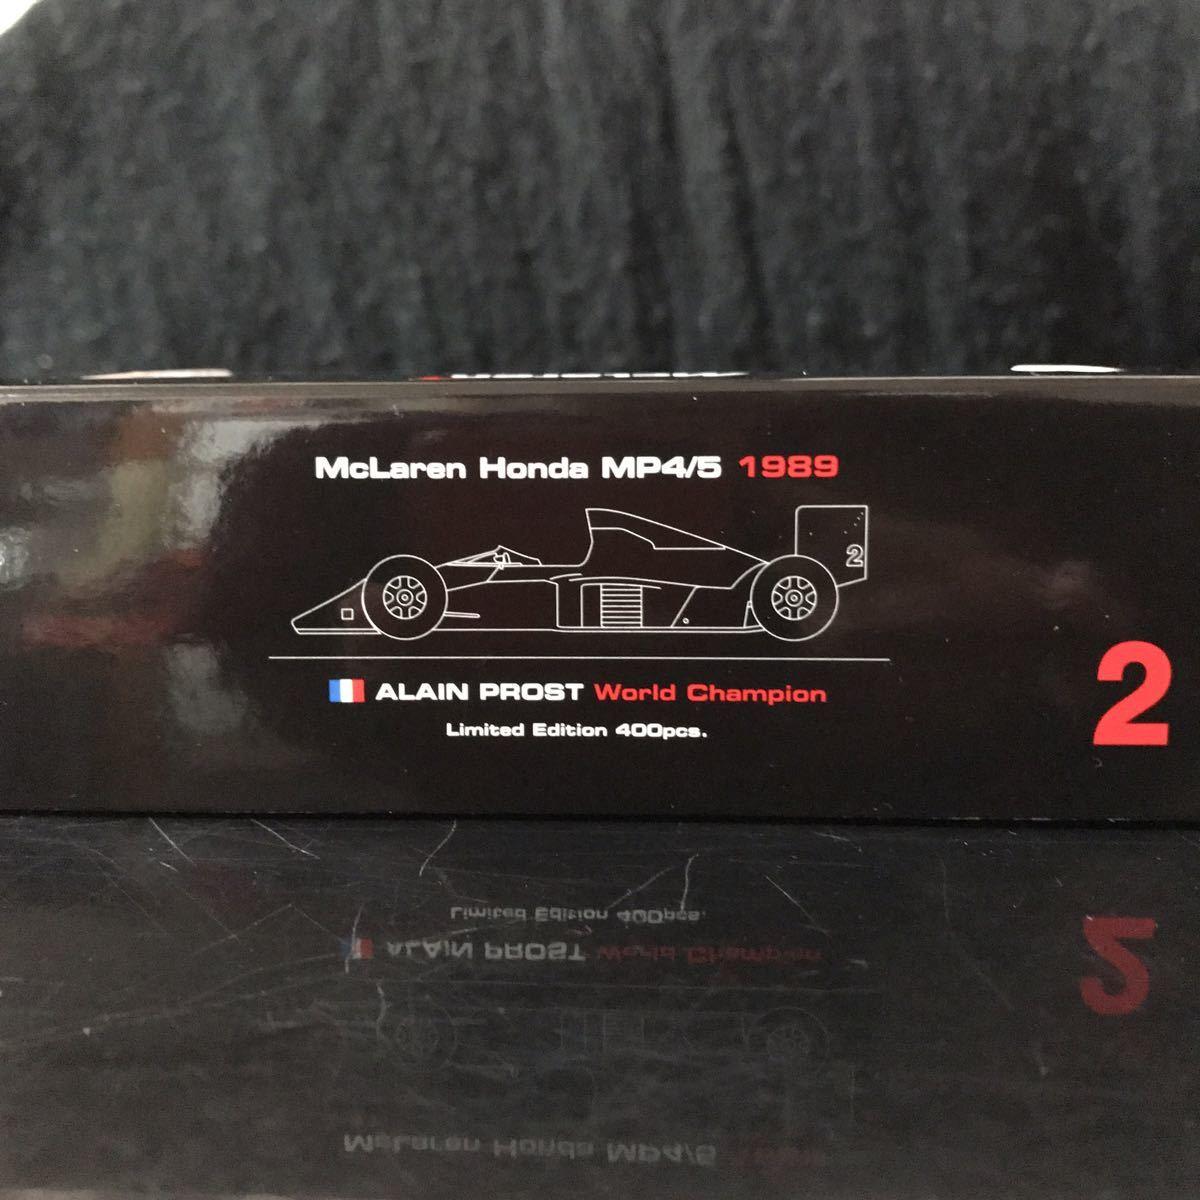 ES別注 スパーク 1/43 ホンダ マールボロ マクラーレン MP4/5 #2 A.プロスト 1989 ワールドチャンピオン マルボロ仕様_画像10